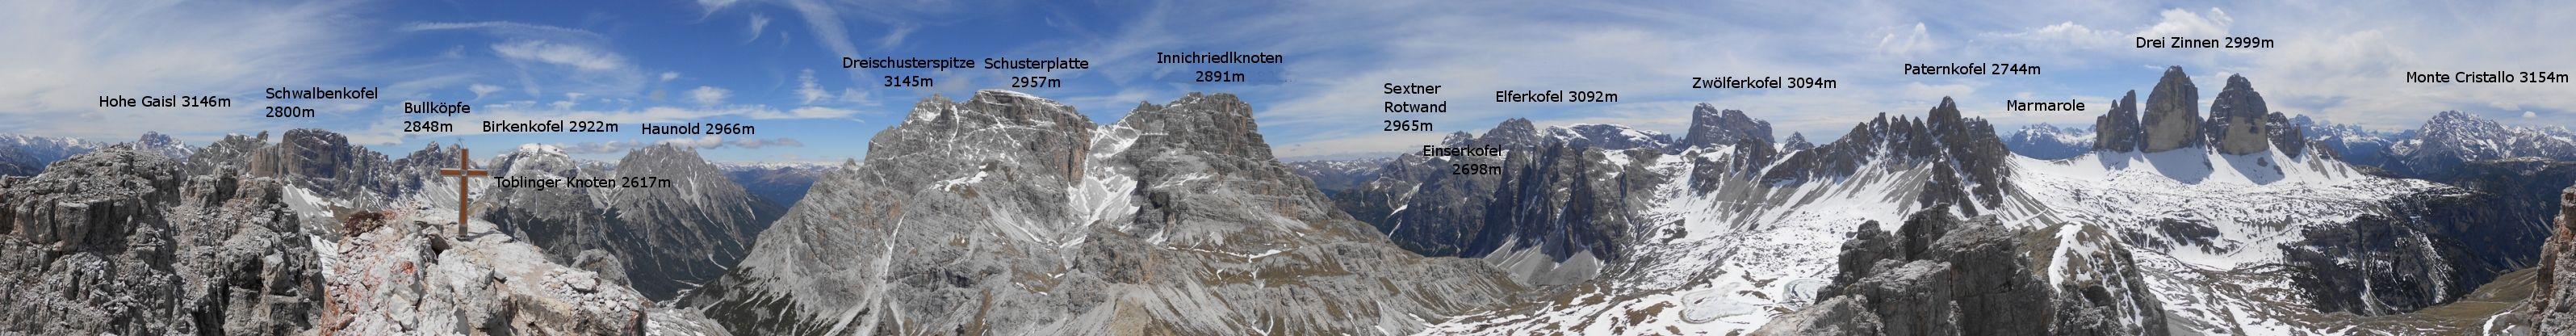 Panorama_ToblingerKnoten